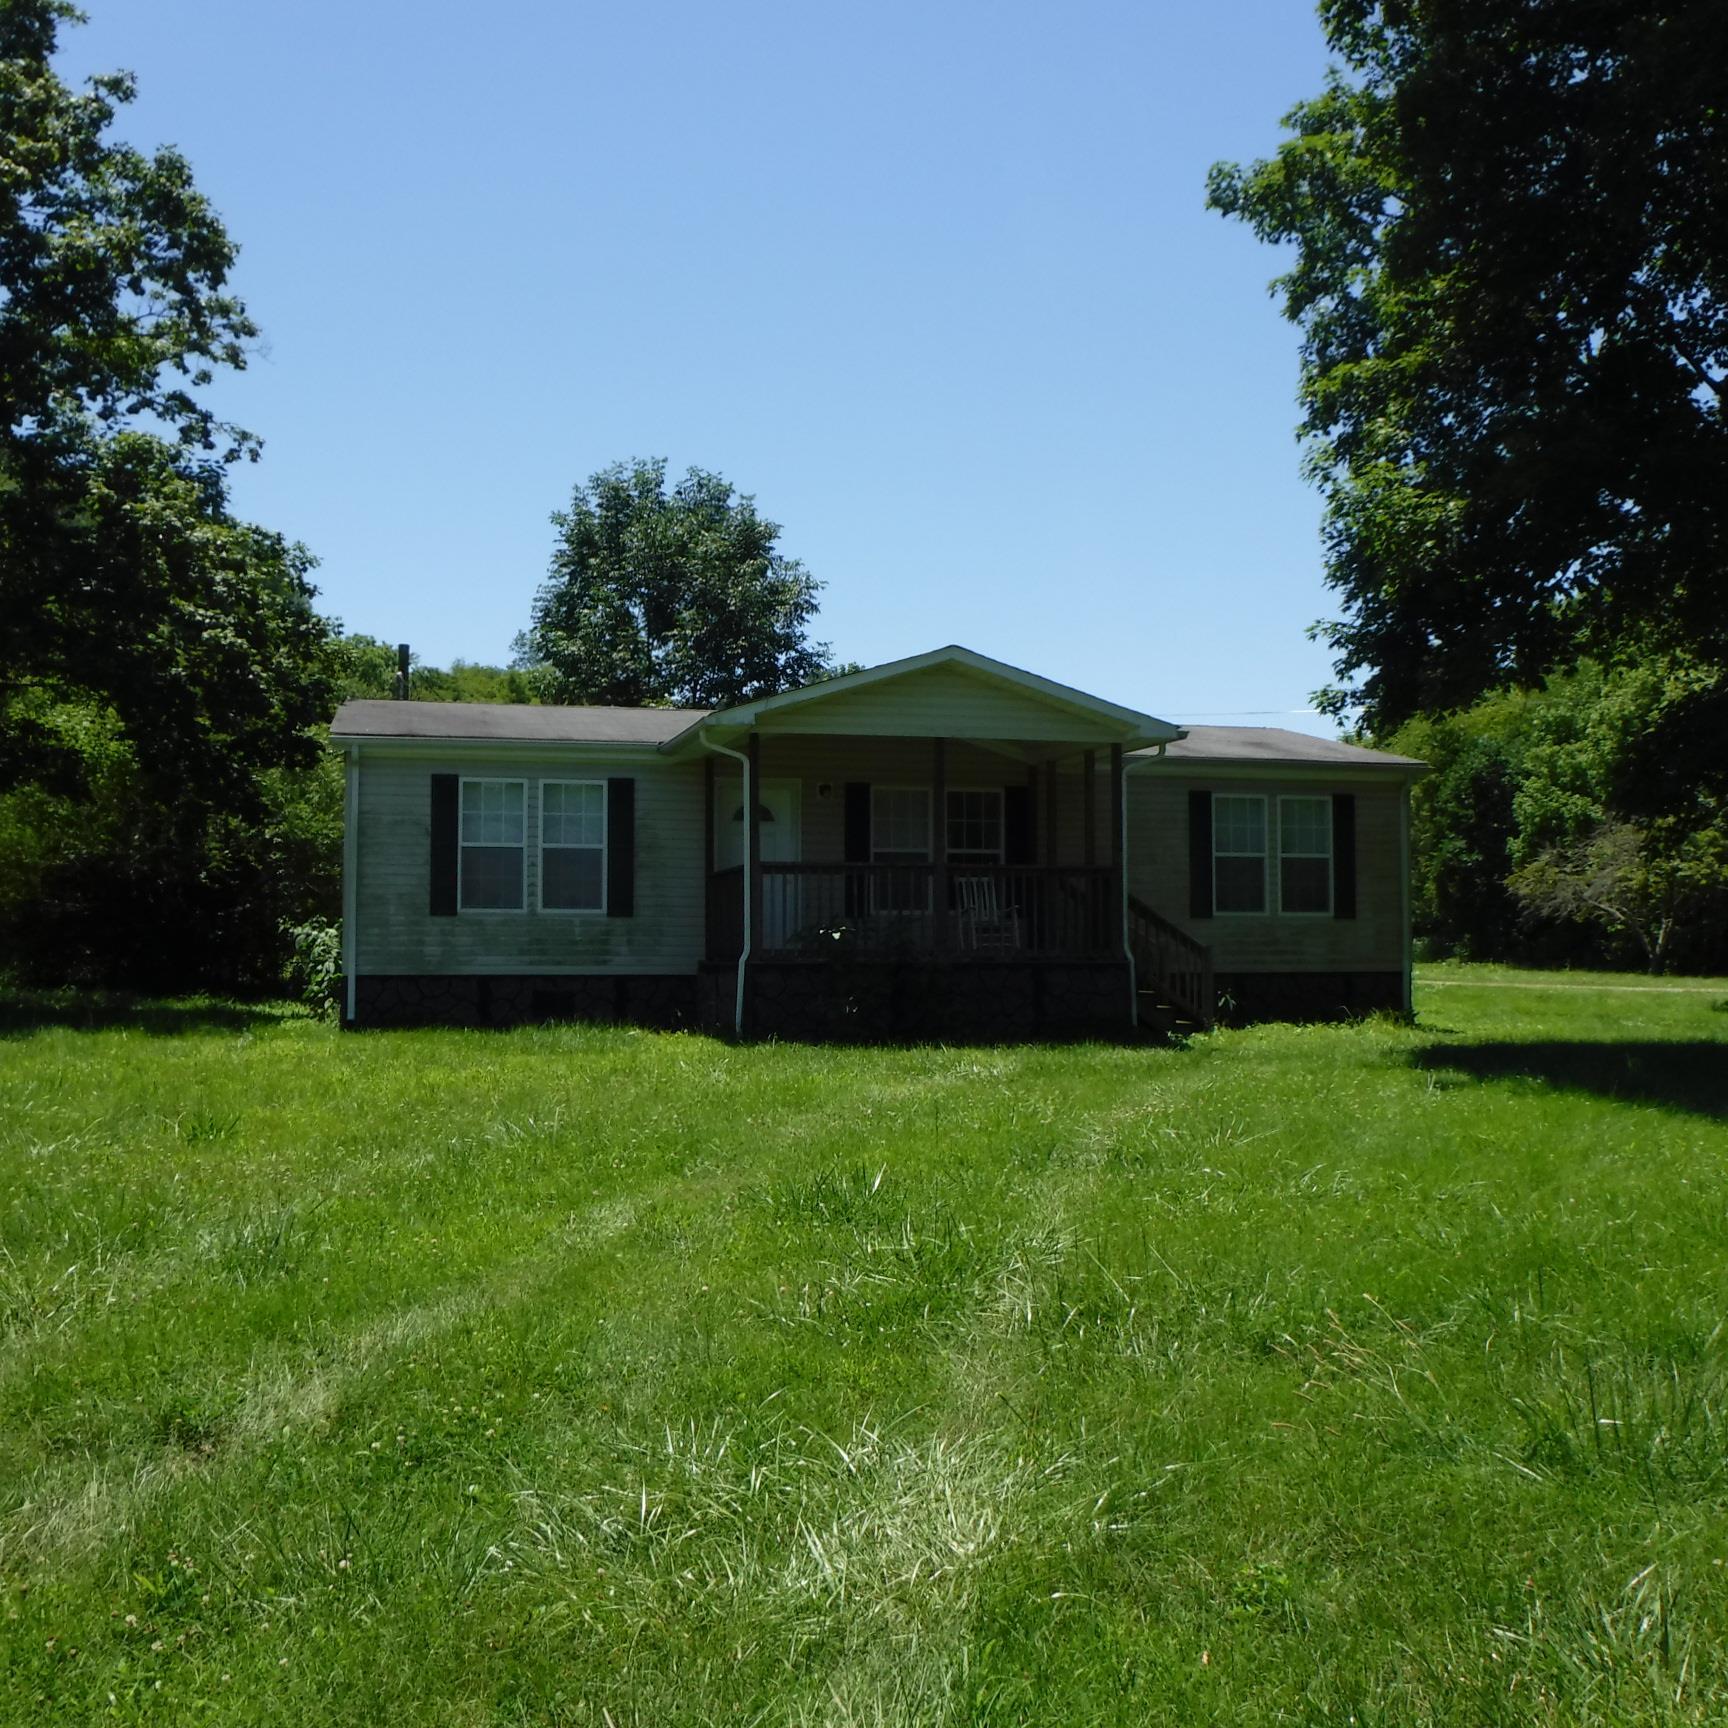 187 S Fork Rd, Whitleyville, TN 38588 - Whitleyville, TN real estate listing